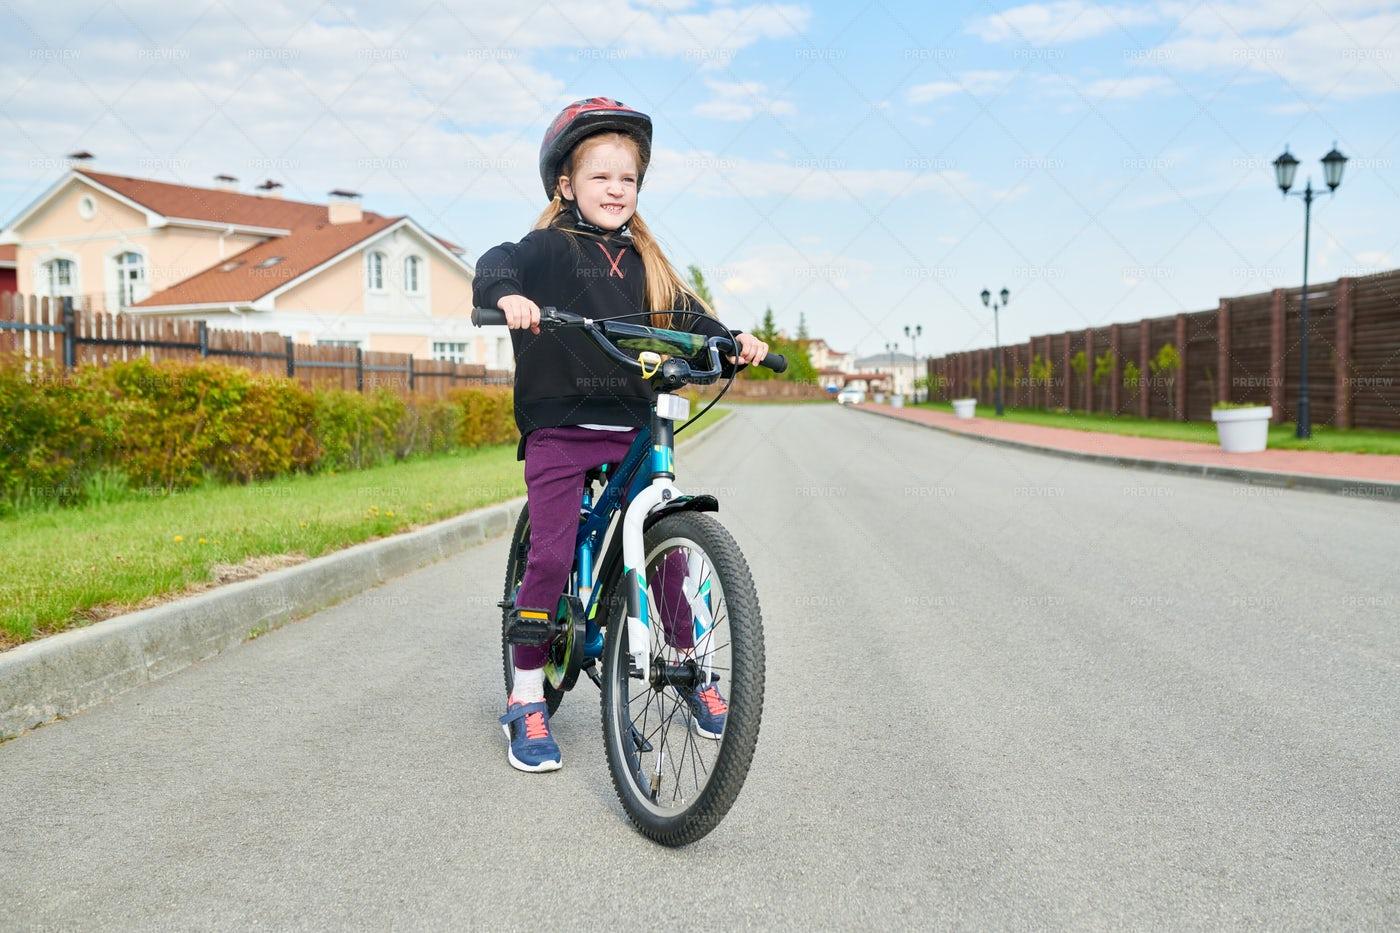 Girl Riding Bike: Stock Photos